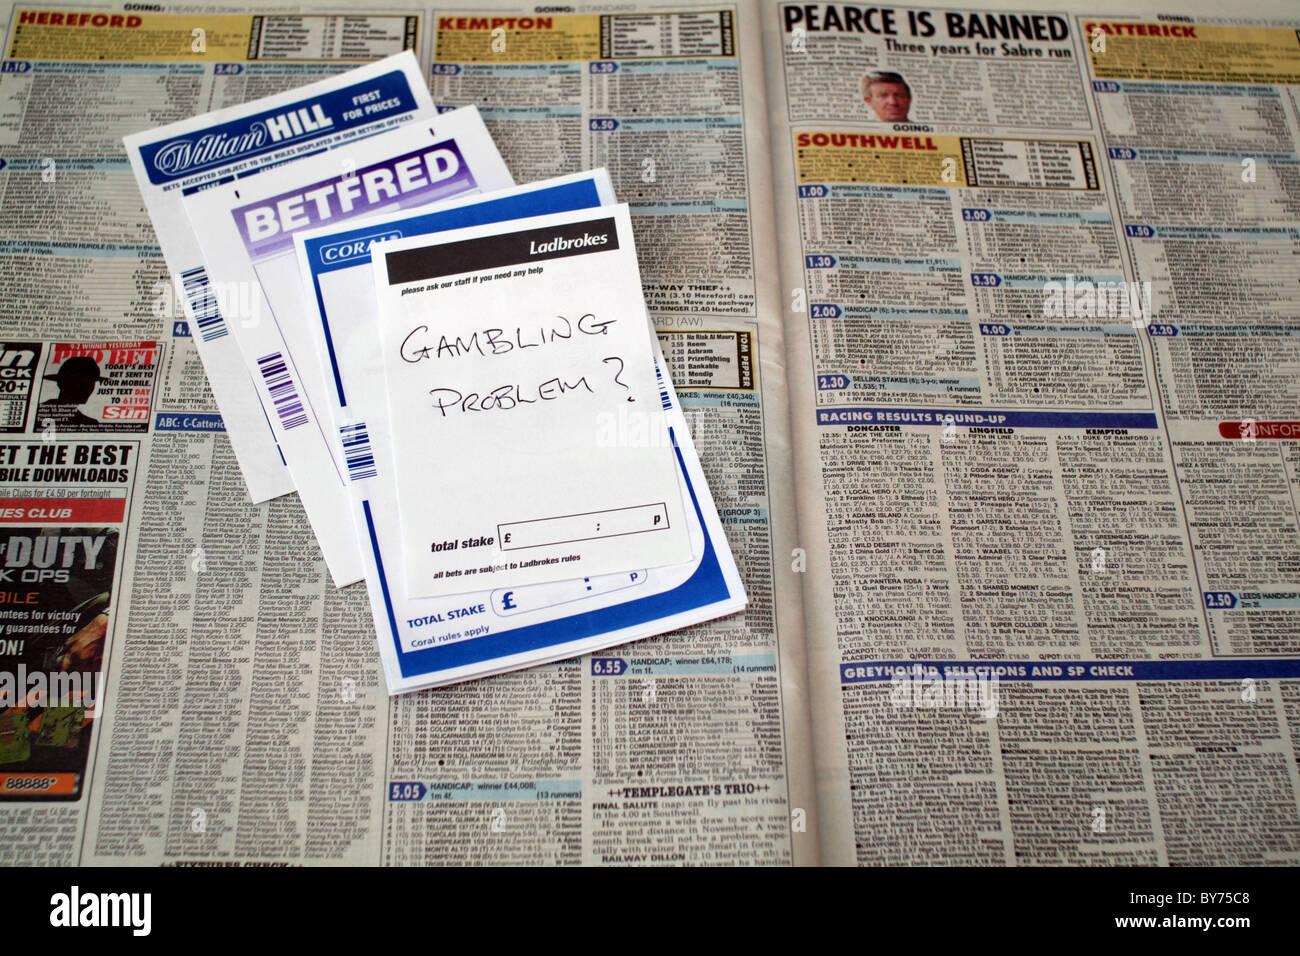 Betting newspaper week 12 college football betting lines